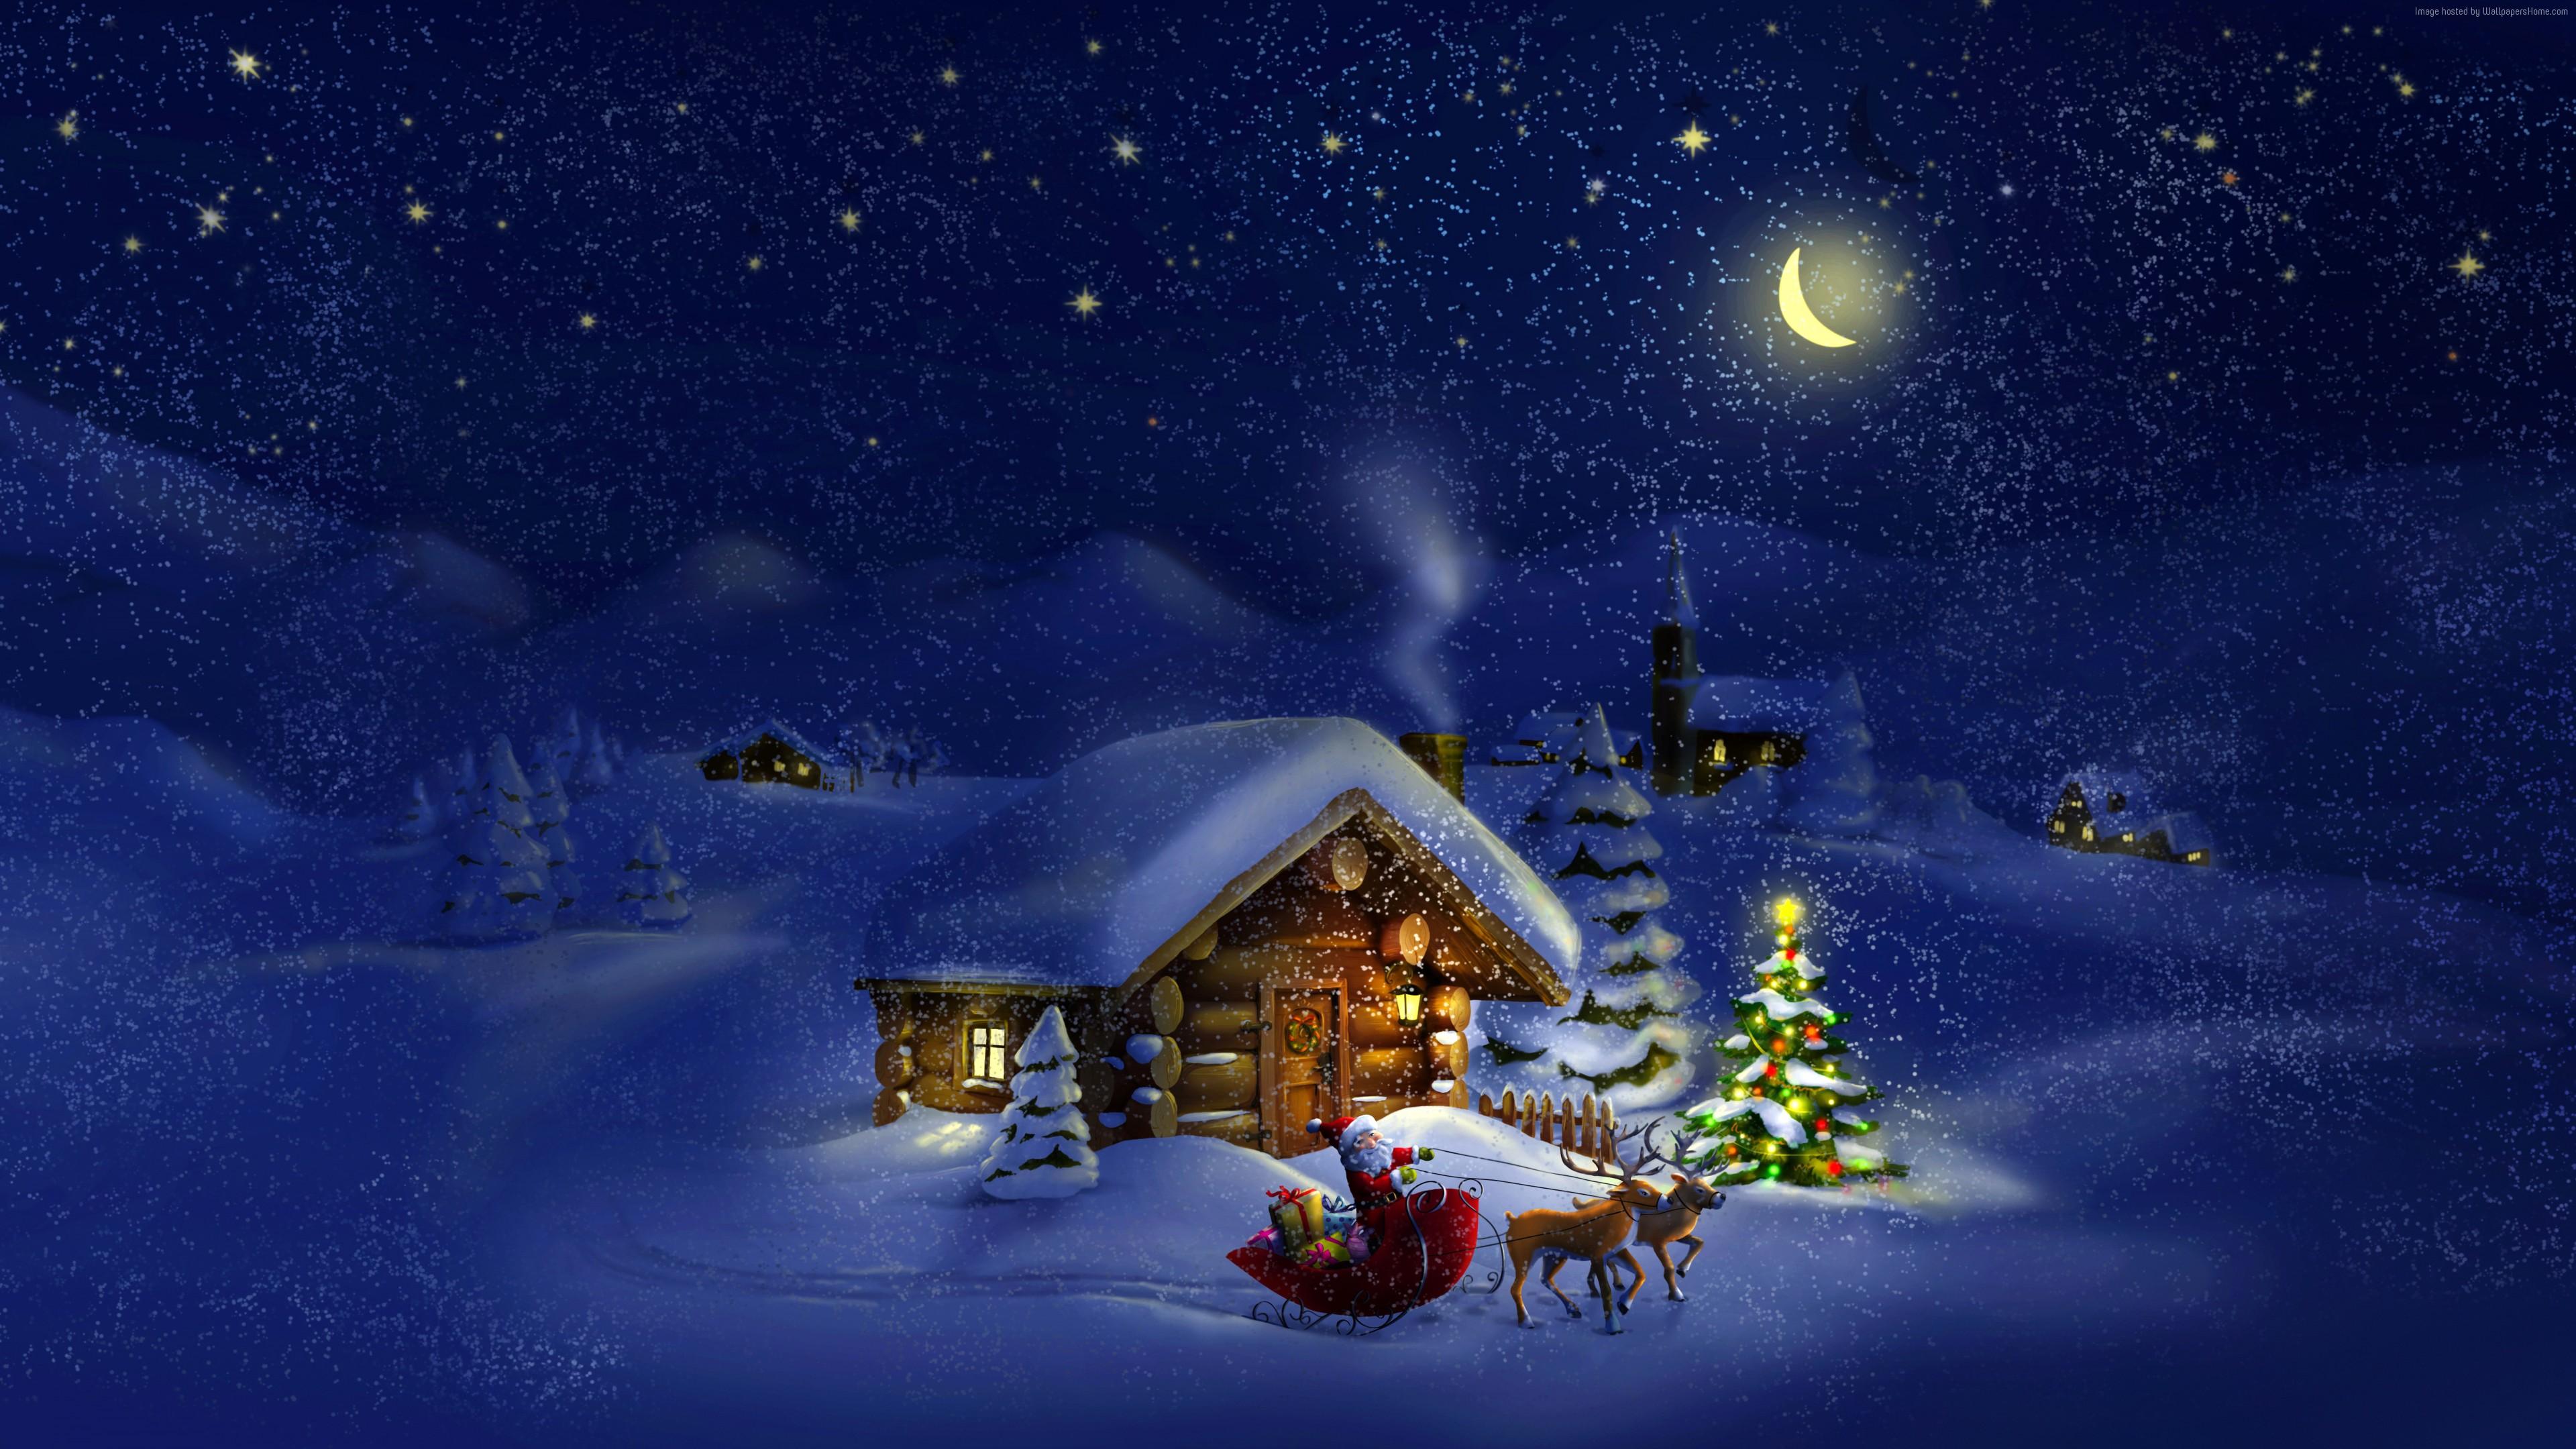 Wallpaper Christmas New Year Santa Deer Moon Night Winter House Snow 4k Holidays Wallpaper Download High Resolution 4k Wallpaper